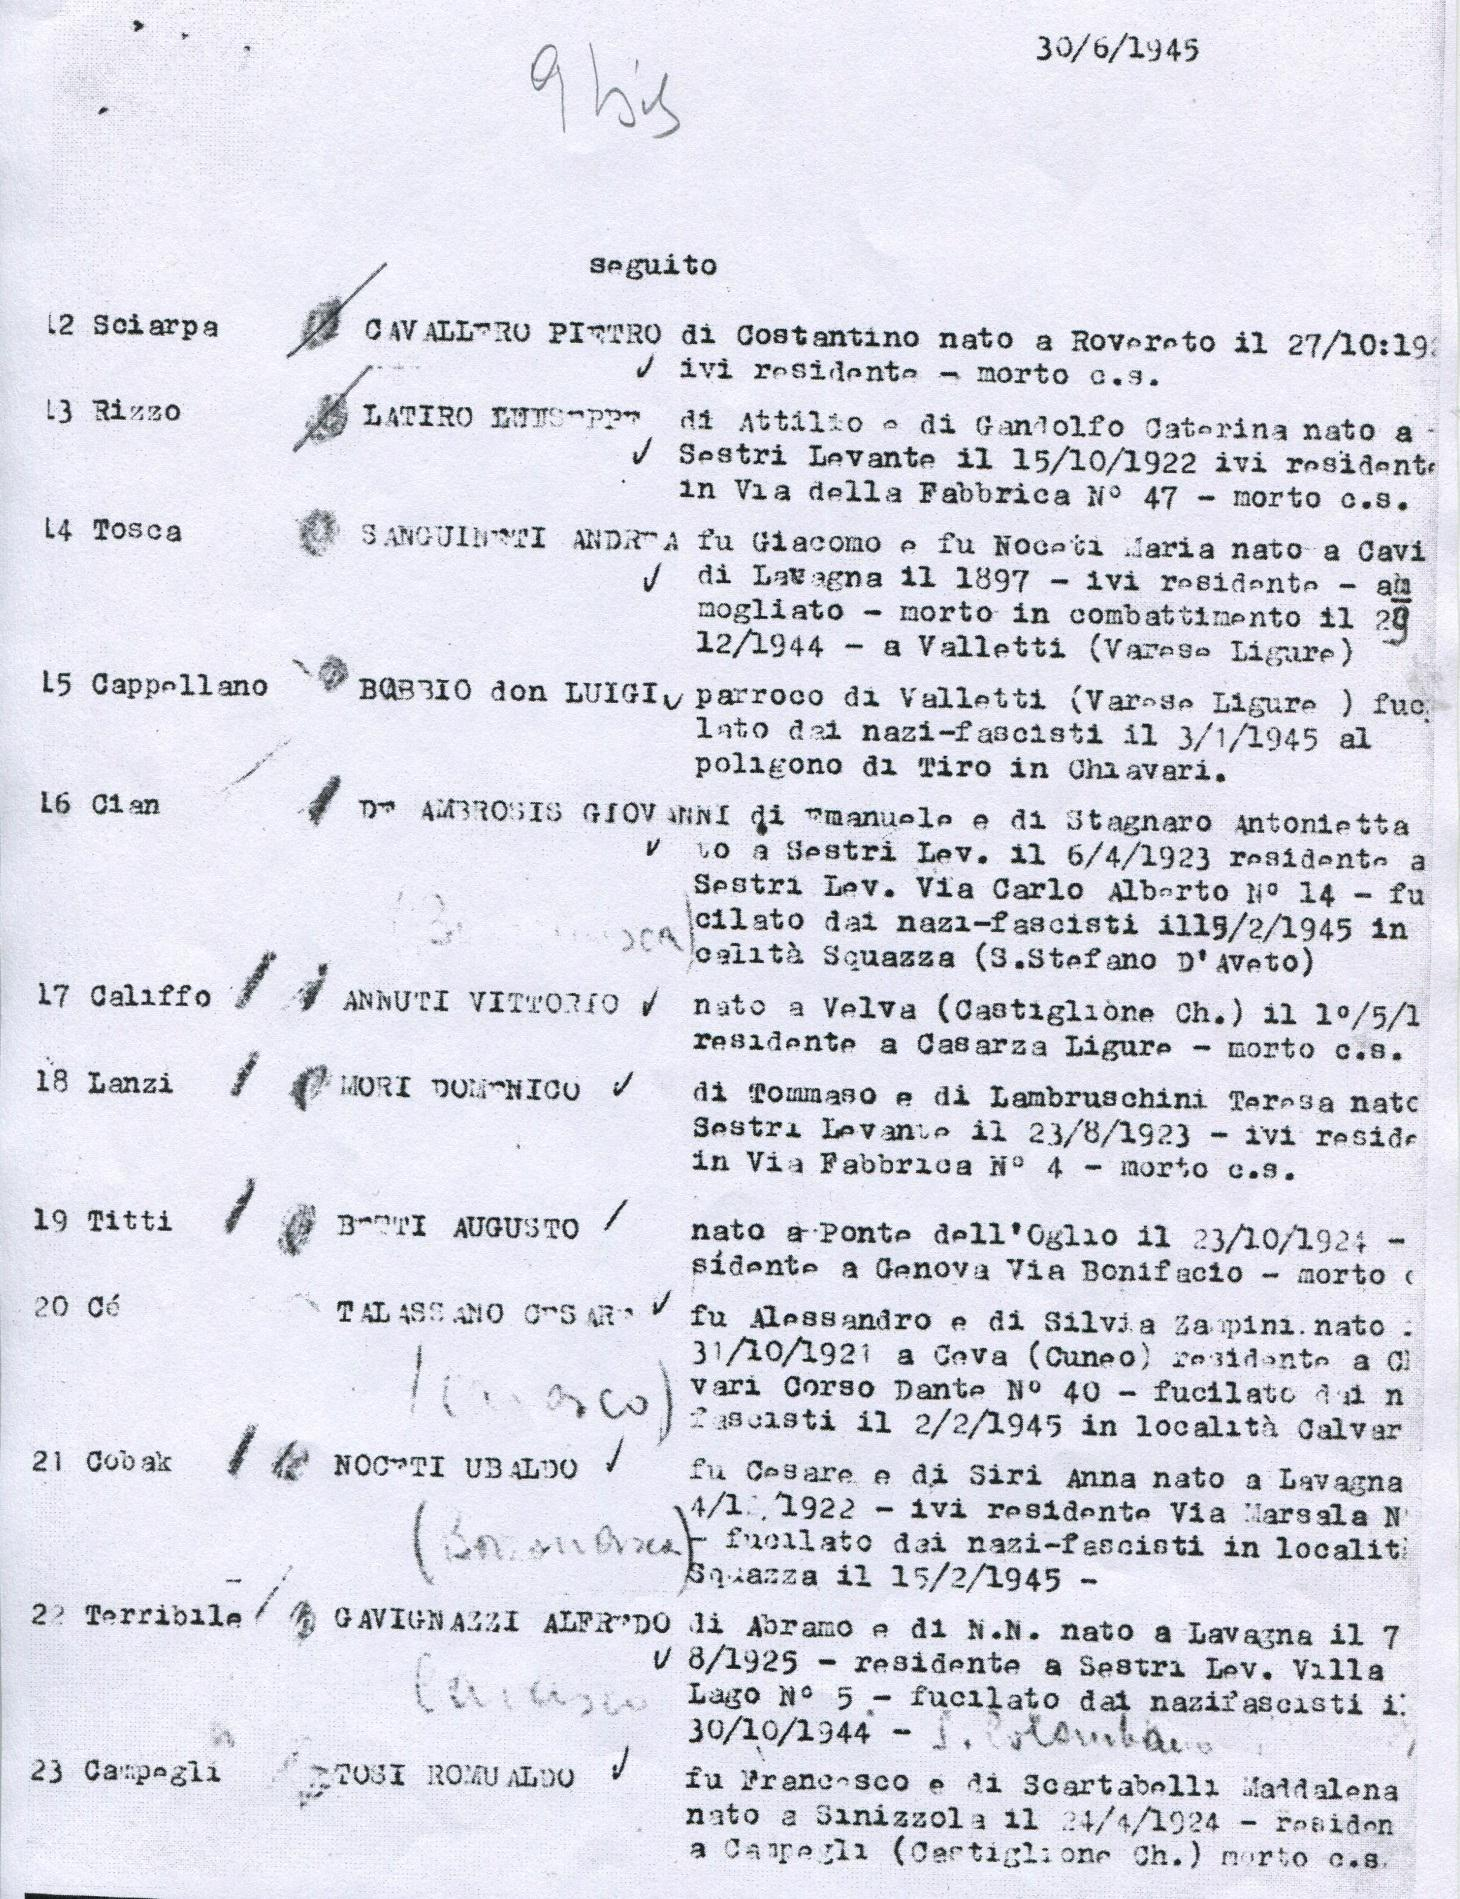 ELENCO DEI PARTIGIANI CADUTI. 2